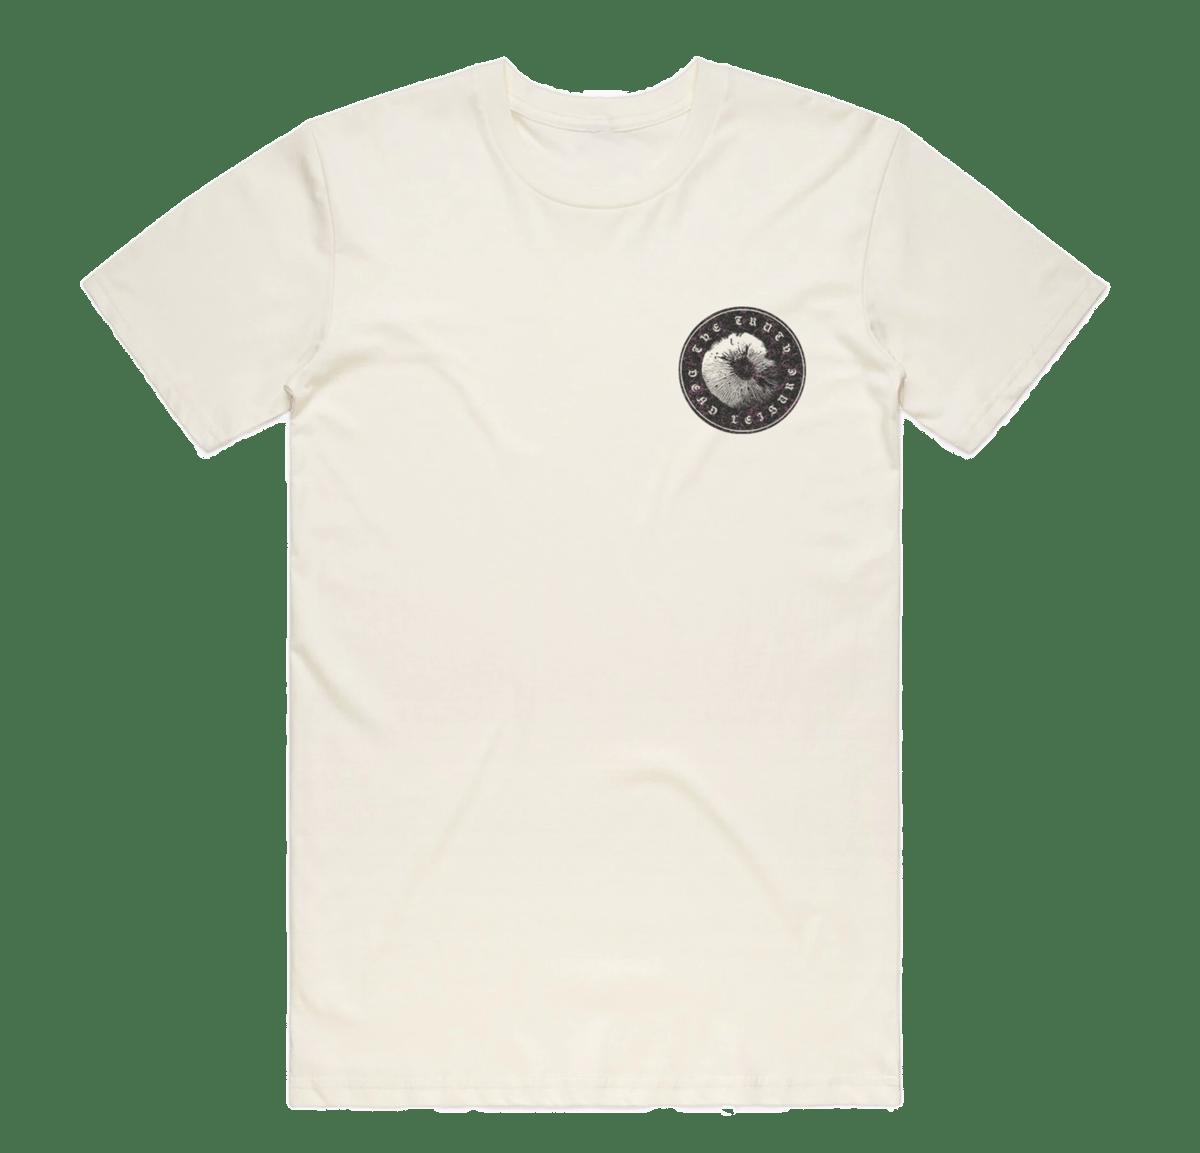 Spore T-shirt - Natural